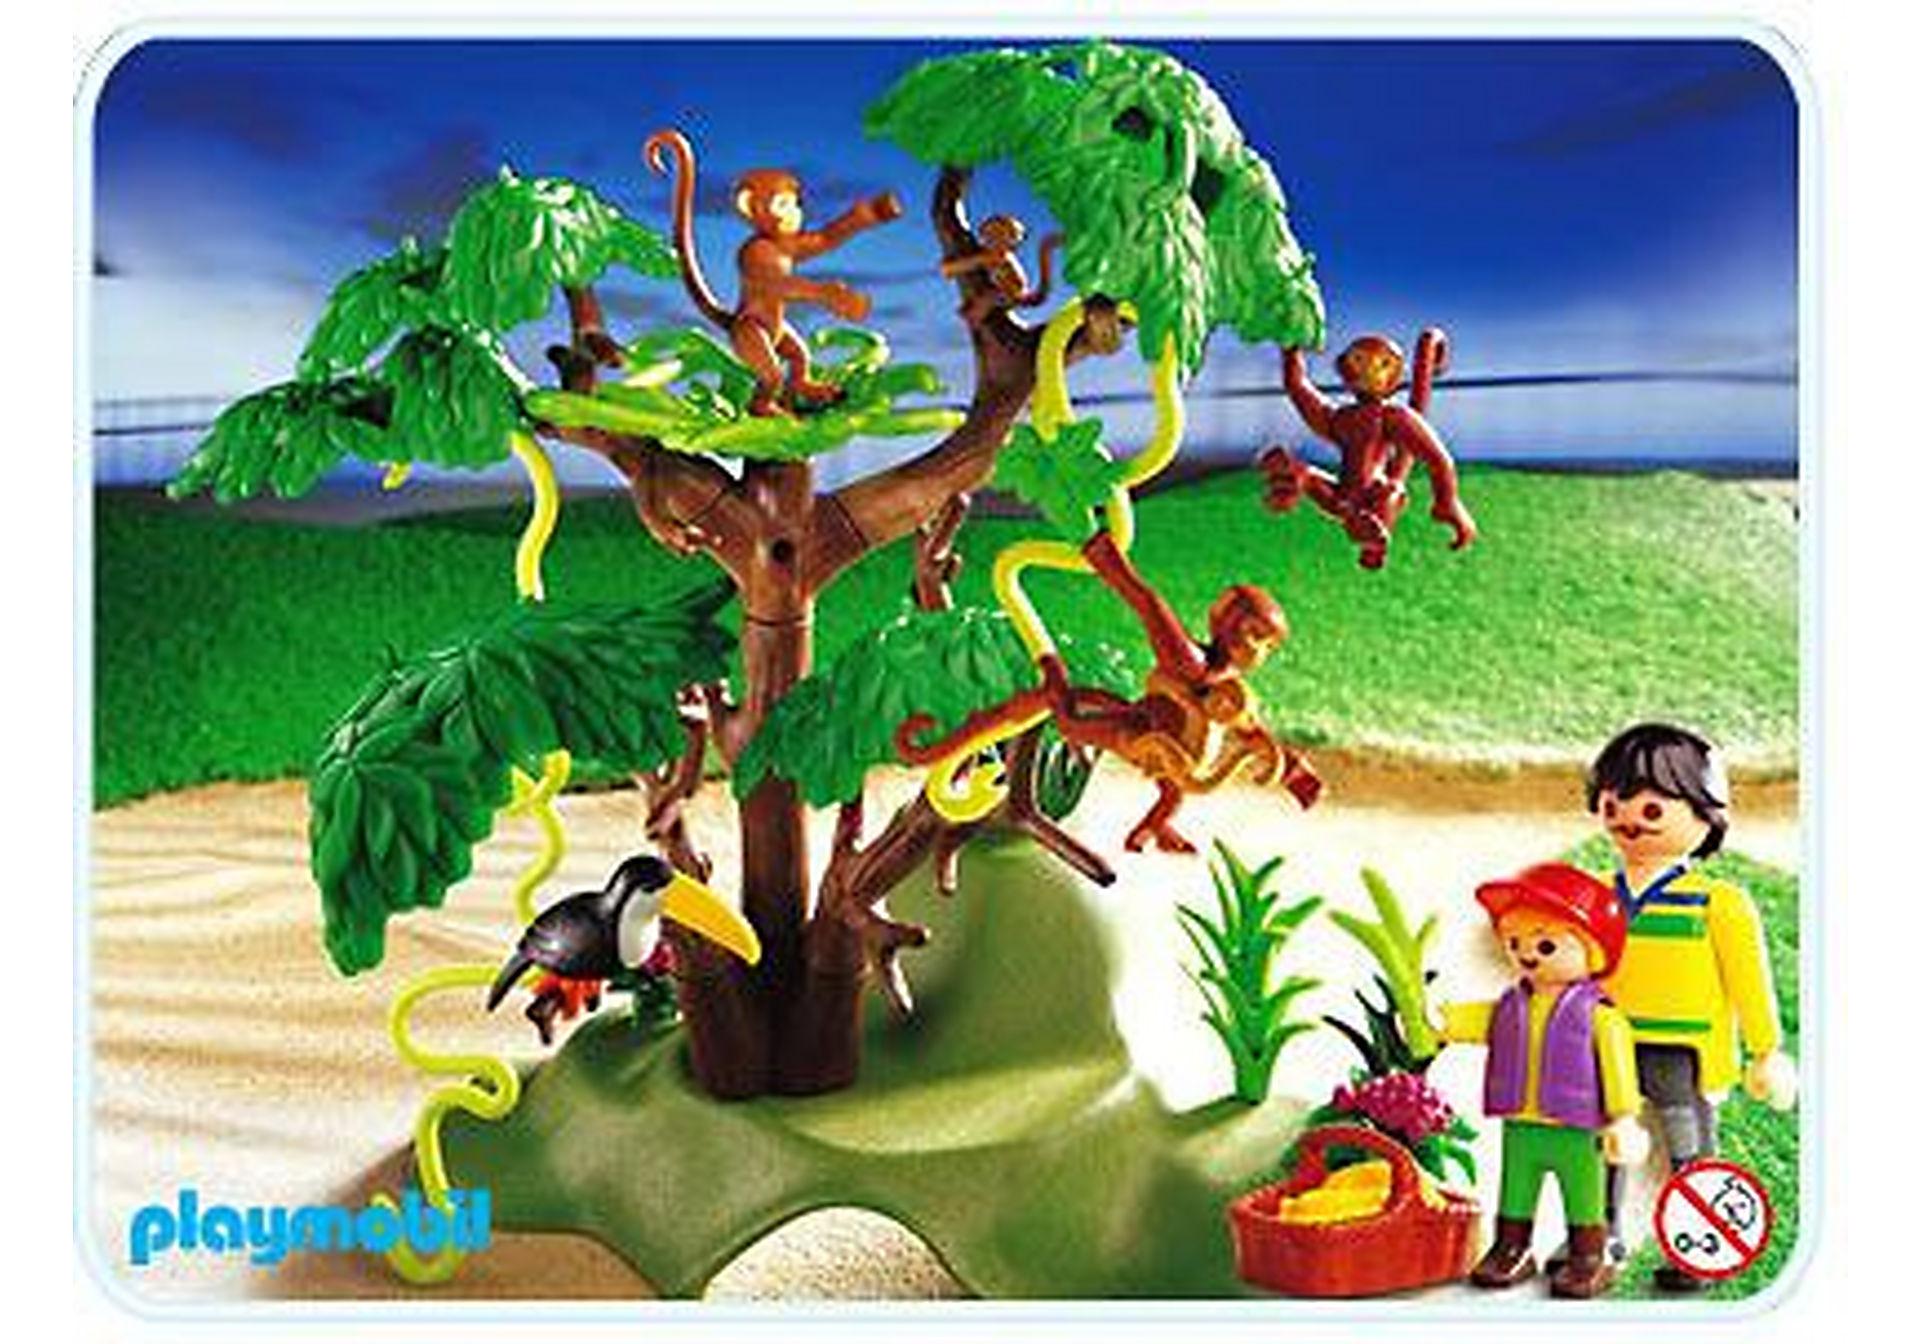 http://media.playmobil.com/i/playmobil/3238-B_product_detail/Famille de singes/arbre